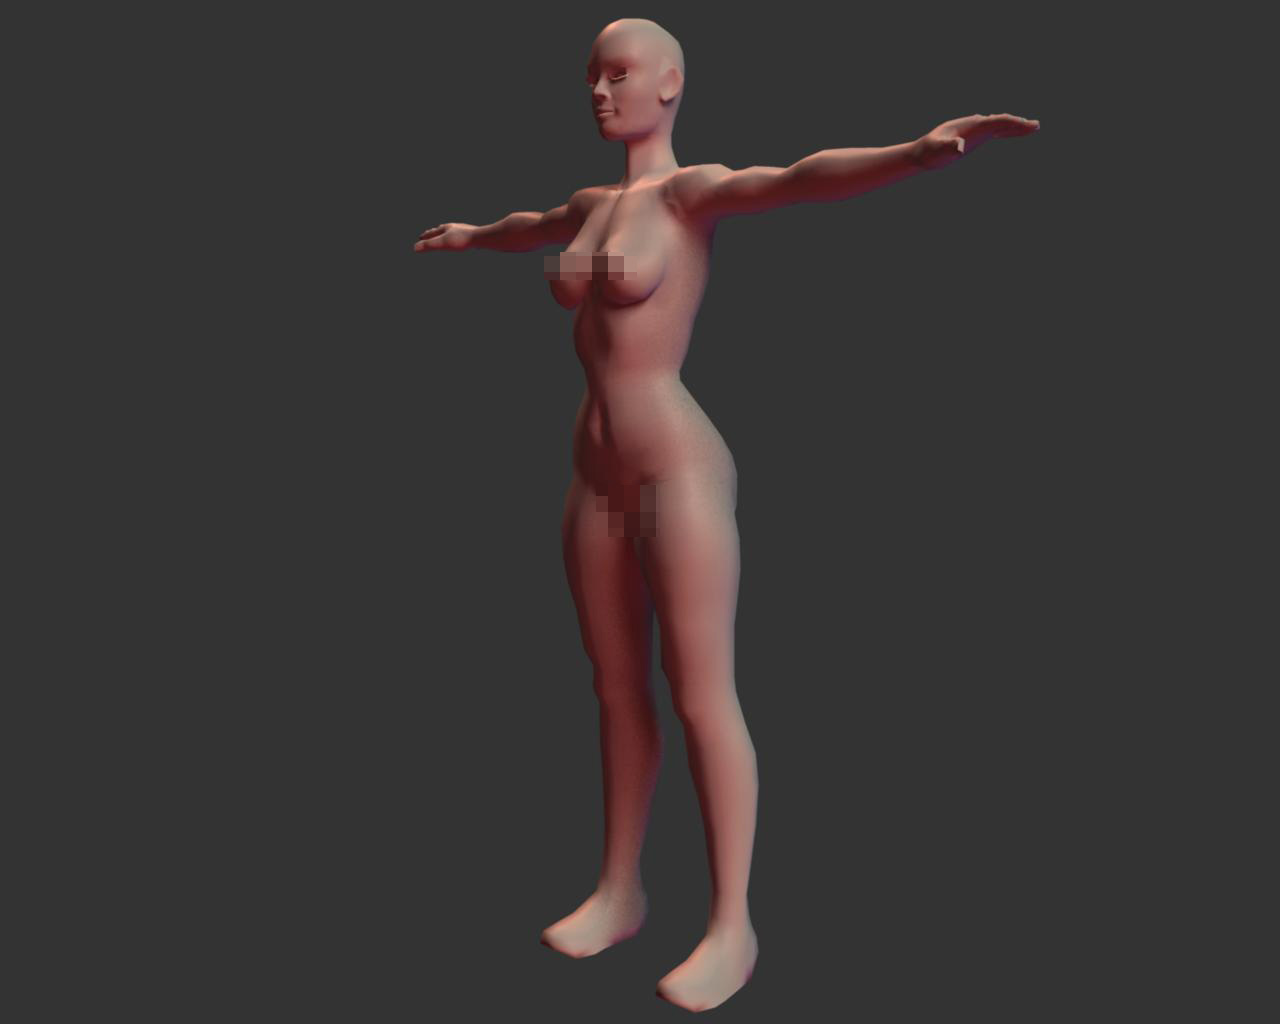 Nude 3d unreal hentai vintage butt